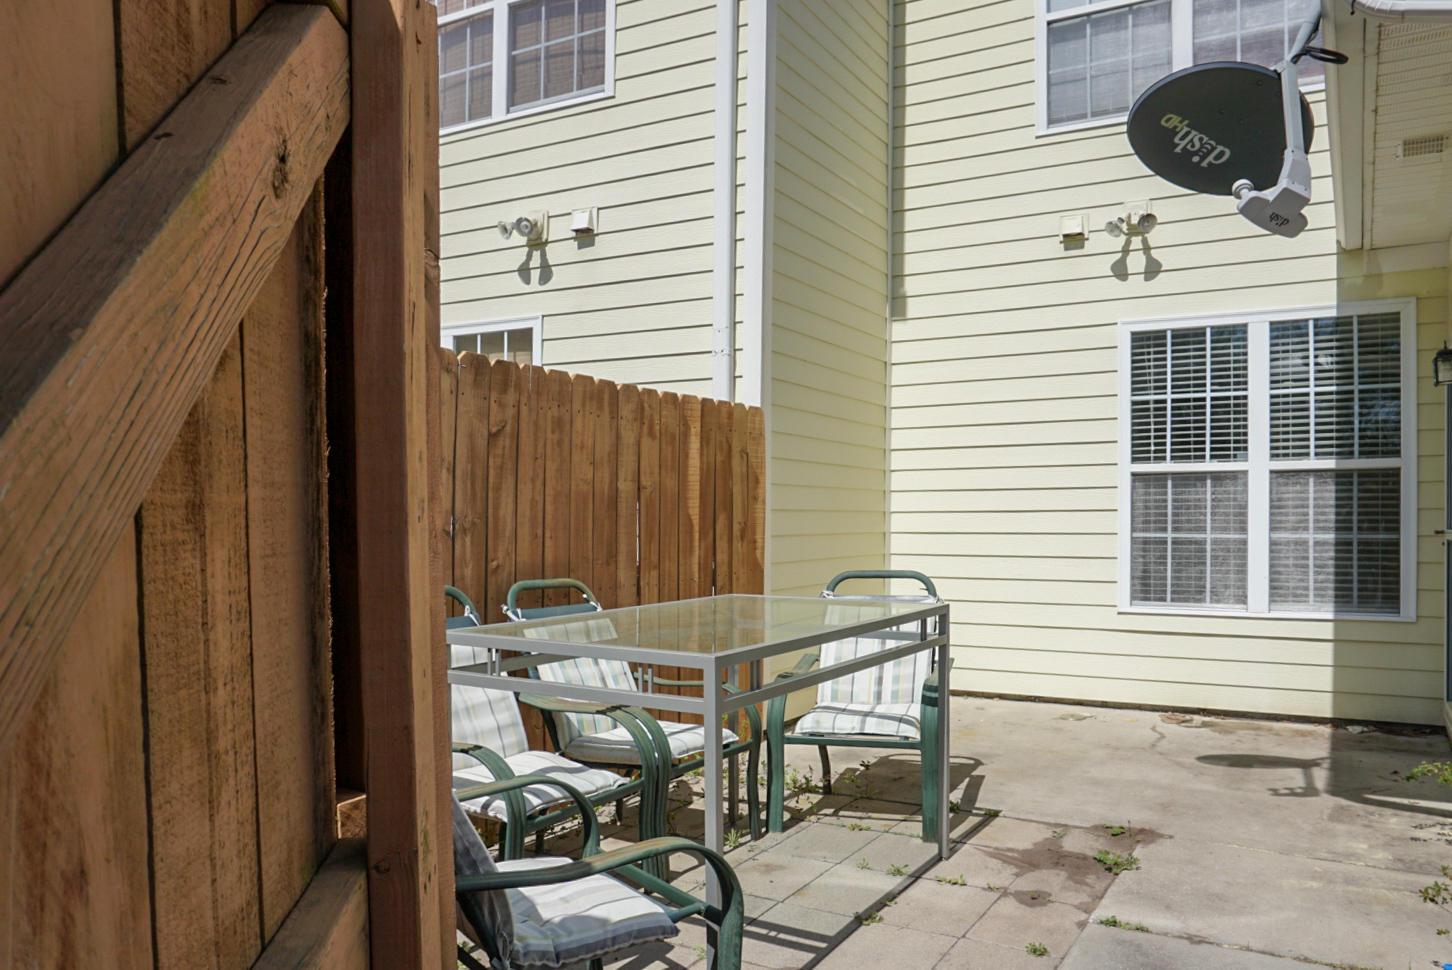 Whitney Lake Homes For Sale - 1763 Brittlebush, Johns Island, SC - 0